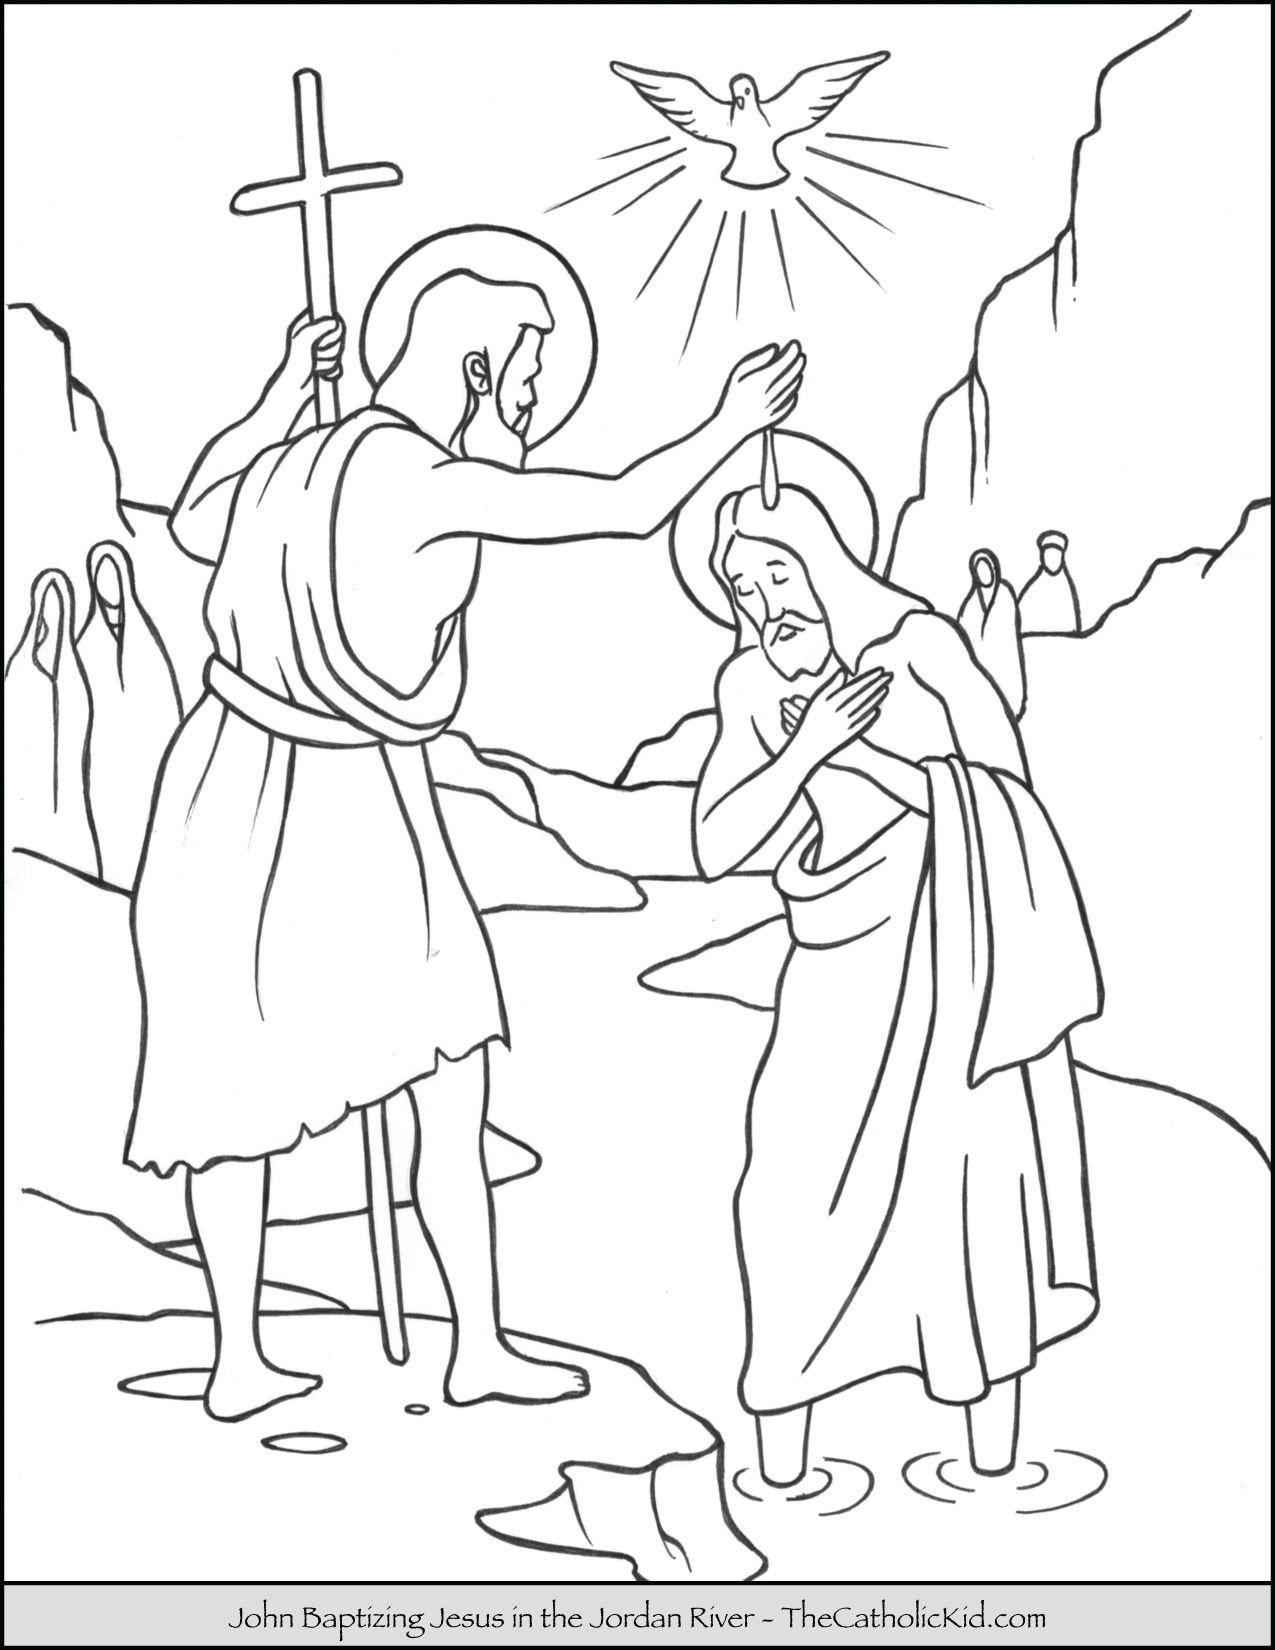 Saint John Baptizing Jesus In The River Jordan Coloring Page Thecatholickid Com Jesus Coloring Pages Coloring Pages Sunday School Coloring Pages